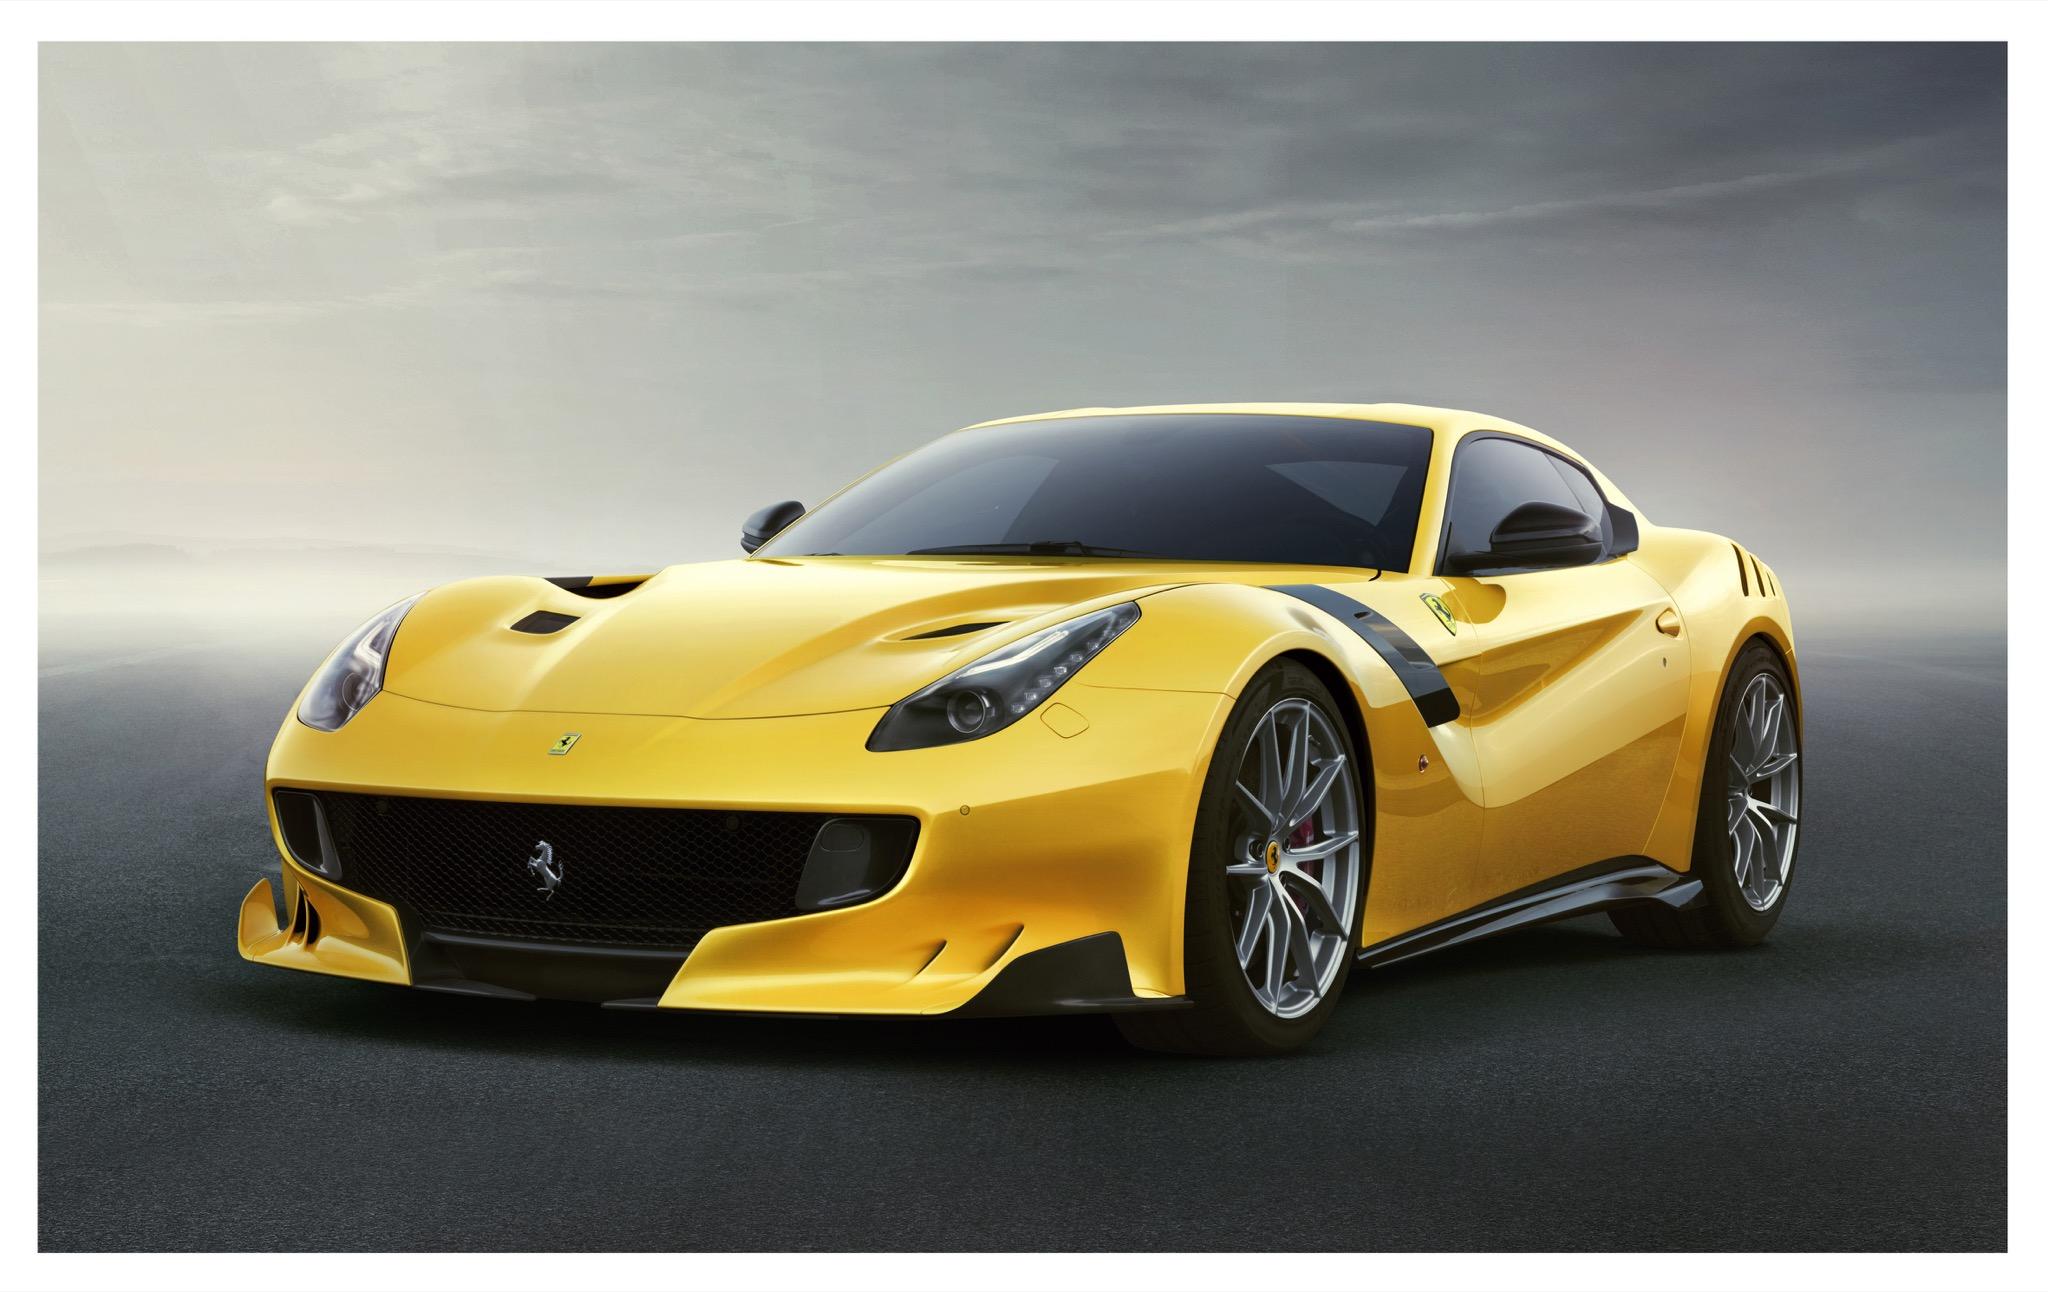 FerrariF12tdf 07